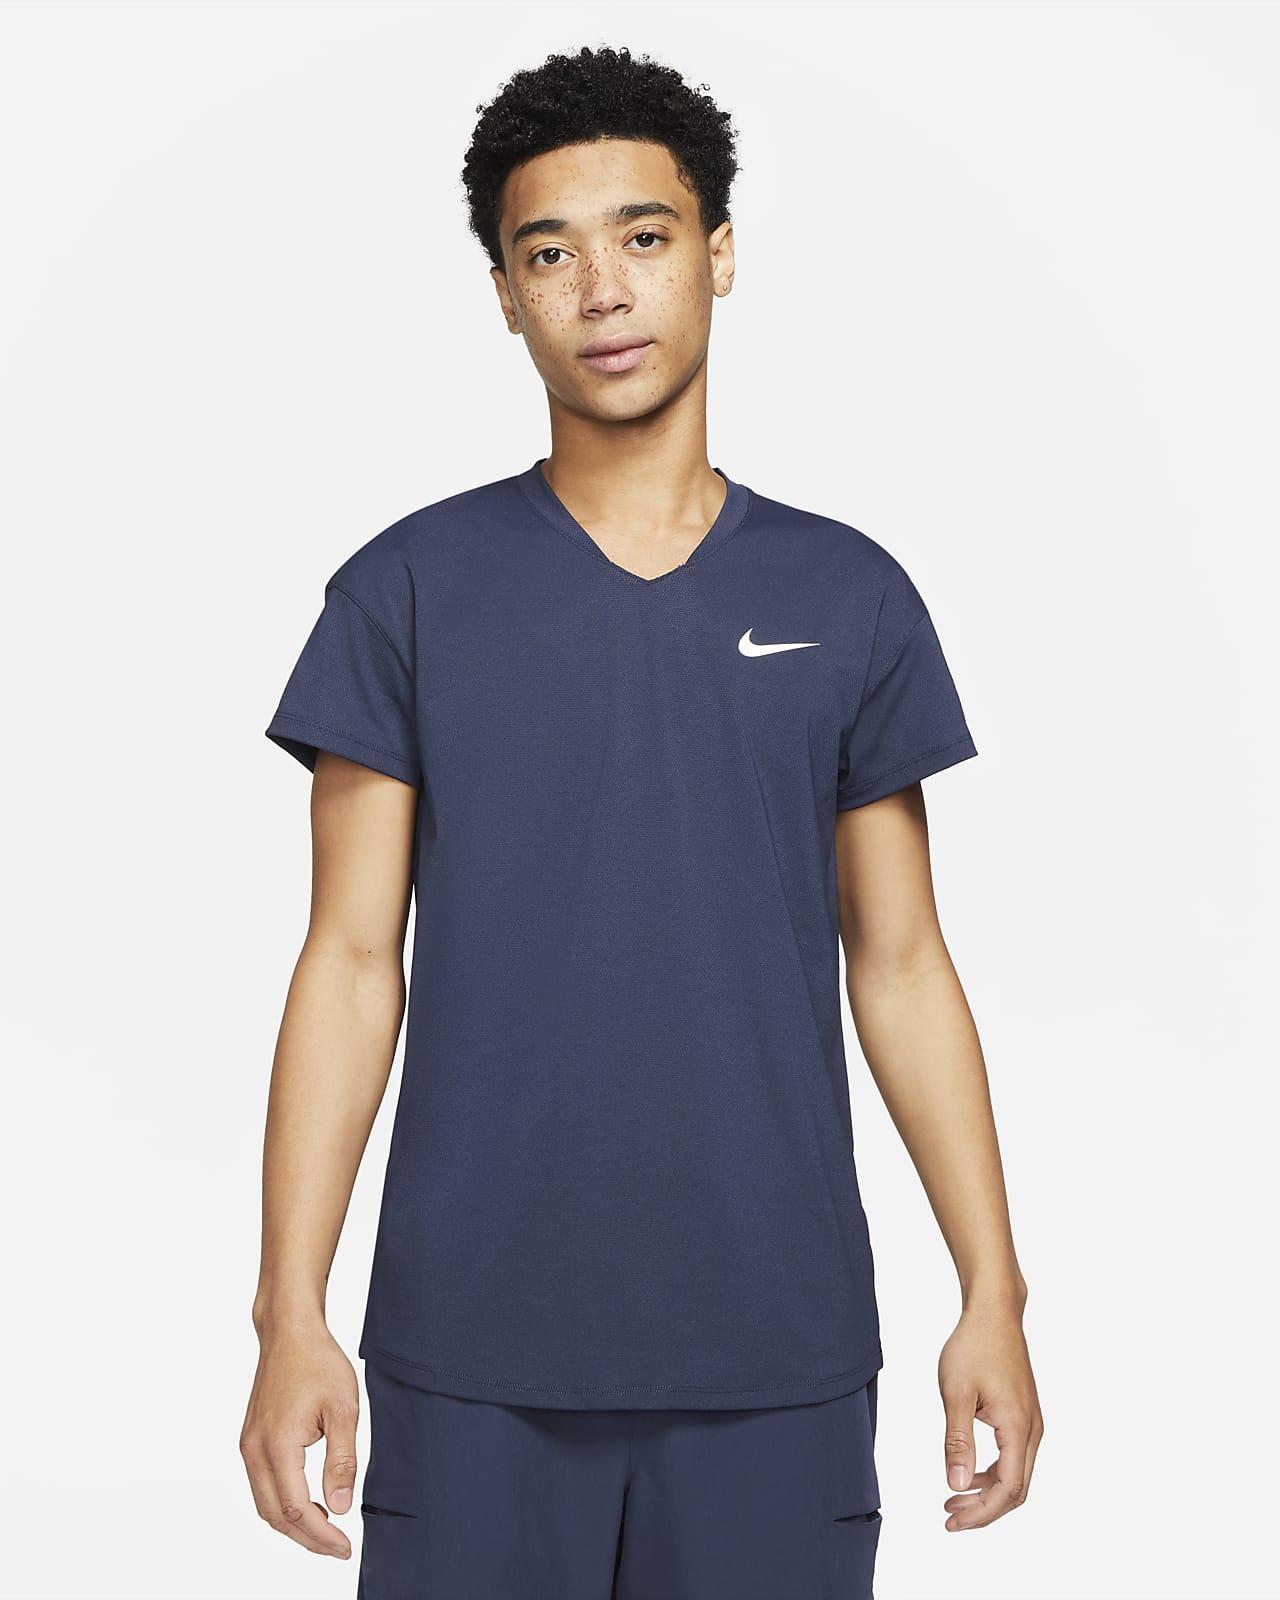 NikeCourt Breathe Slam Men's Tennis Top